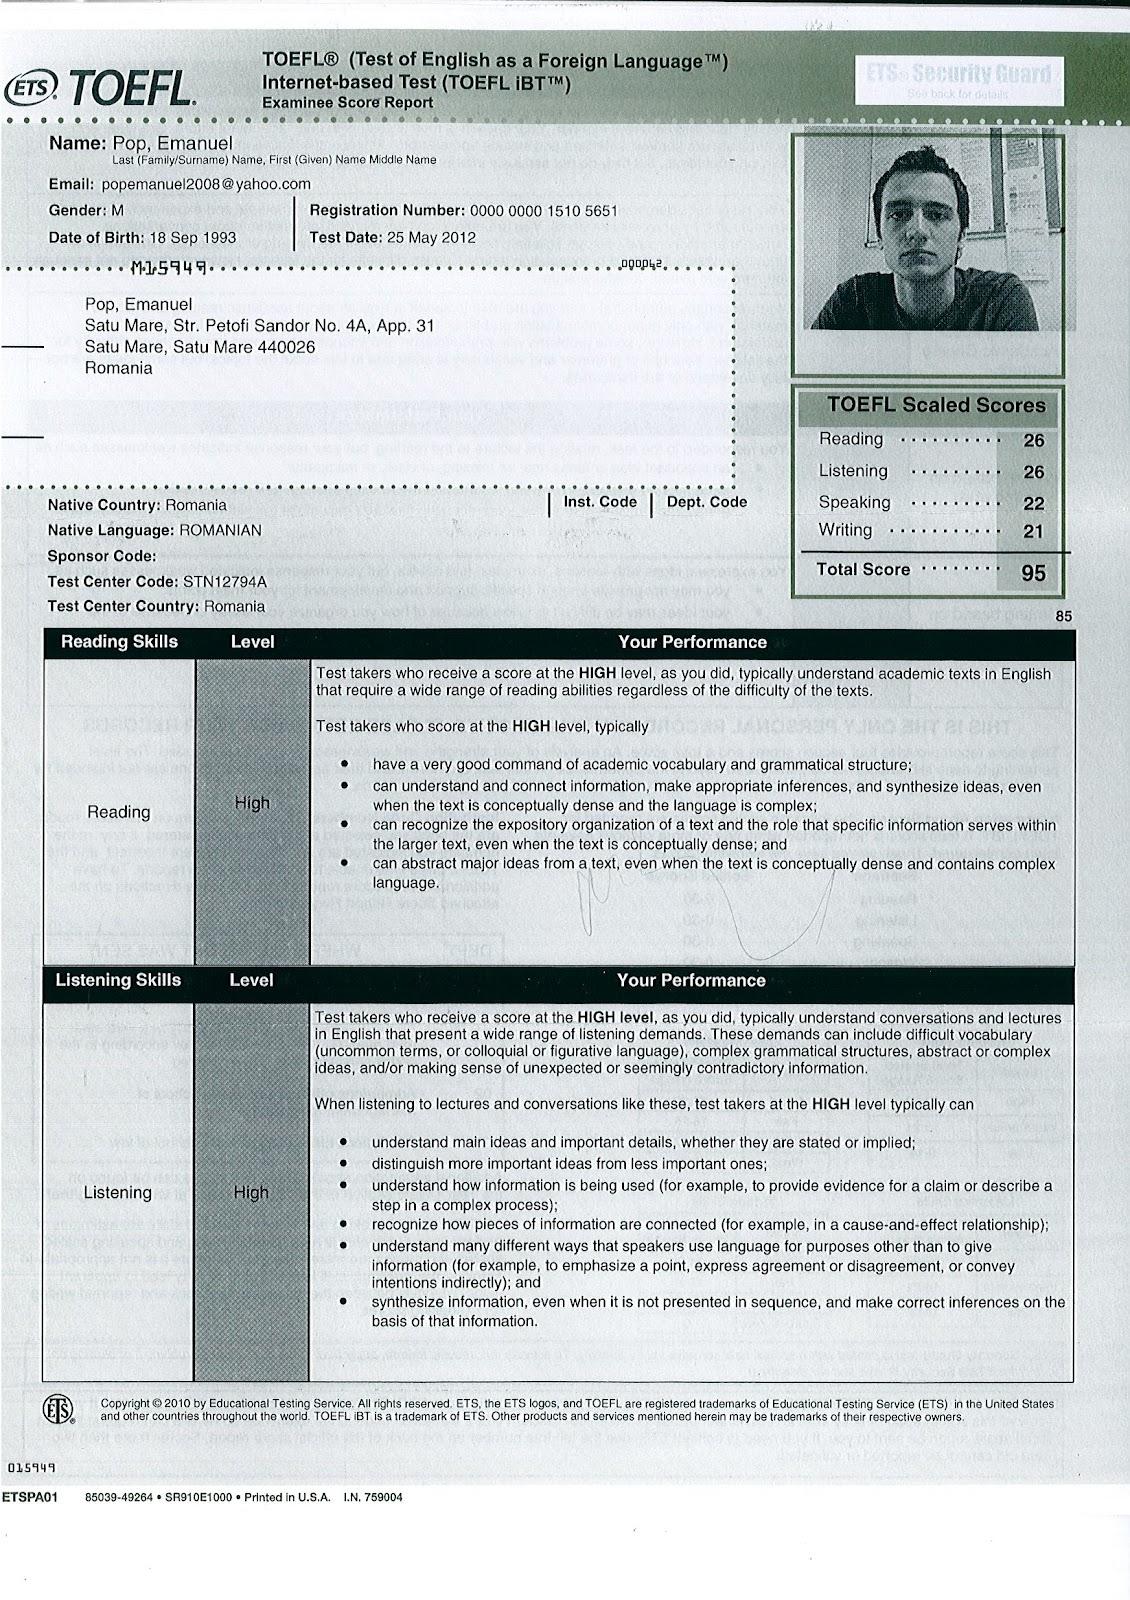 Image Result For Multi Level Front Steps: TOEFL Results: 1086116470 TOEFL IBT Results